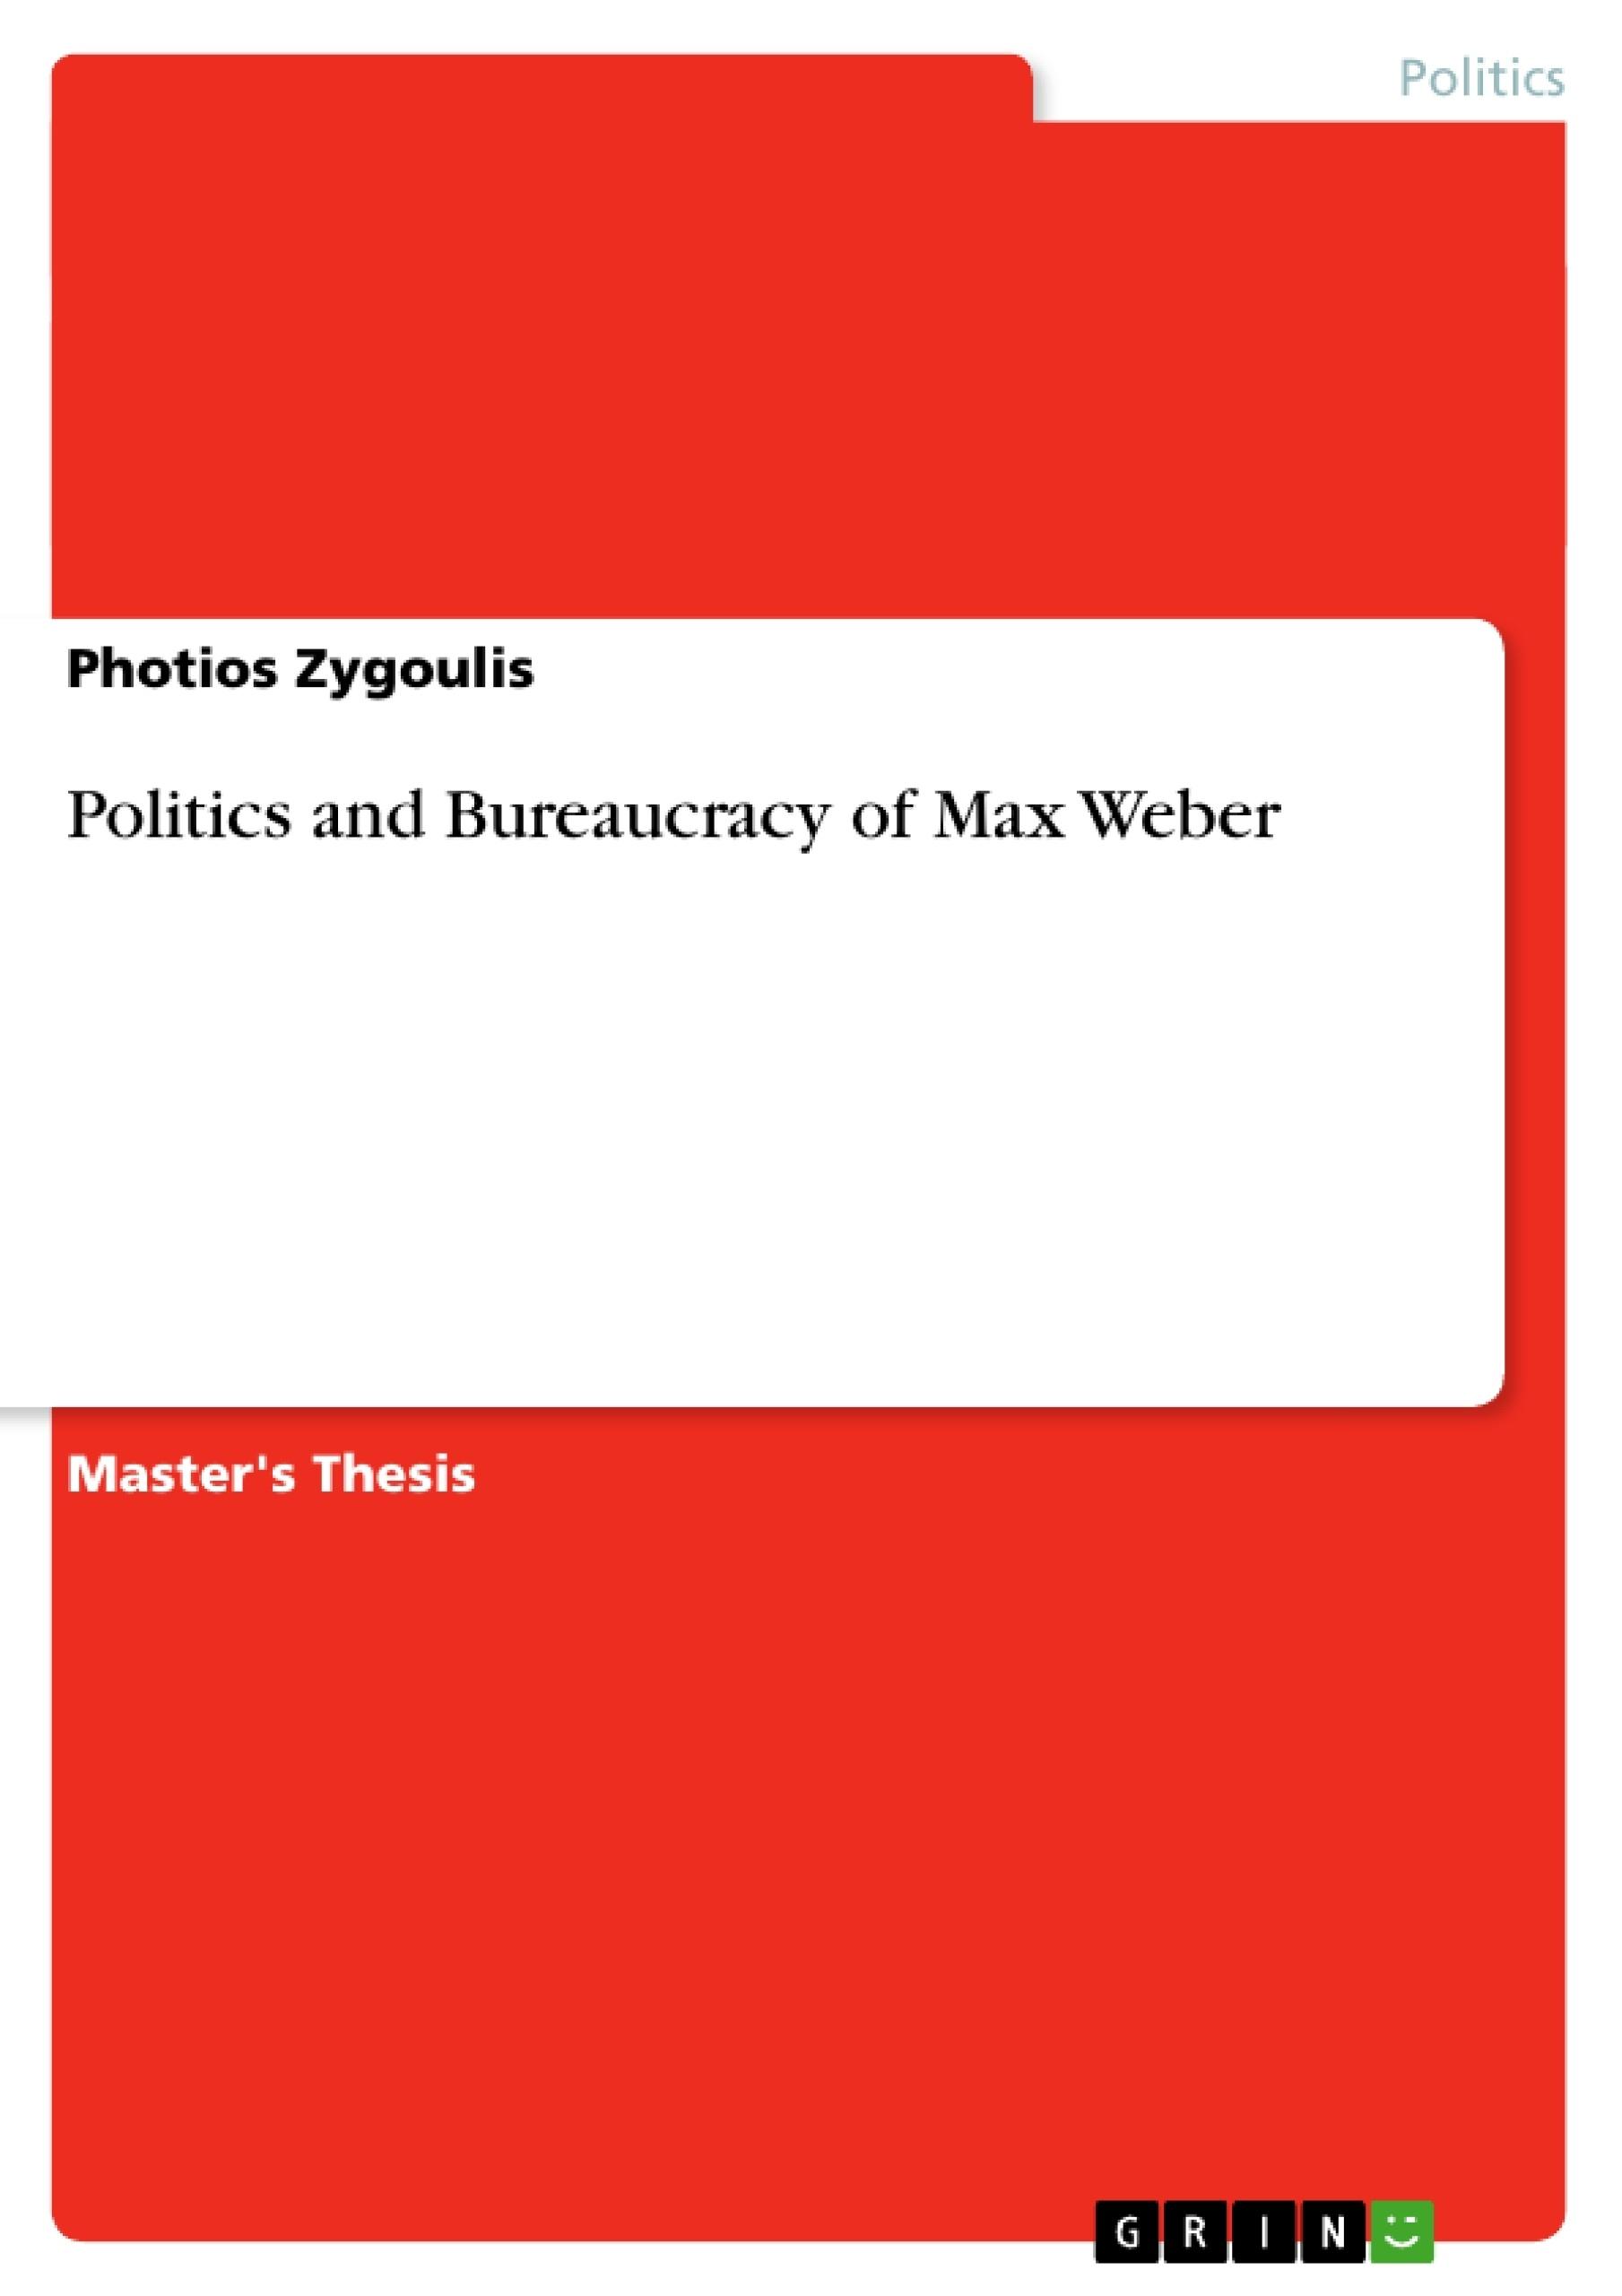 Title: Politics and Bureaucracy of Max Weber